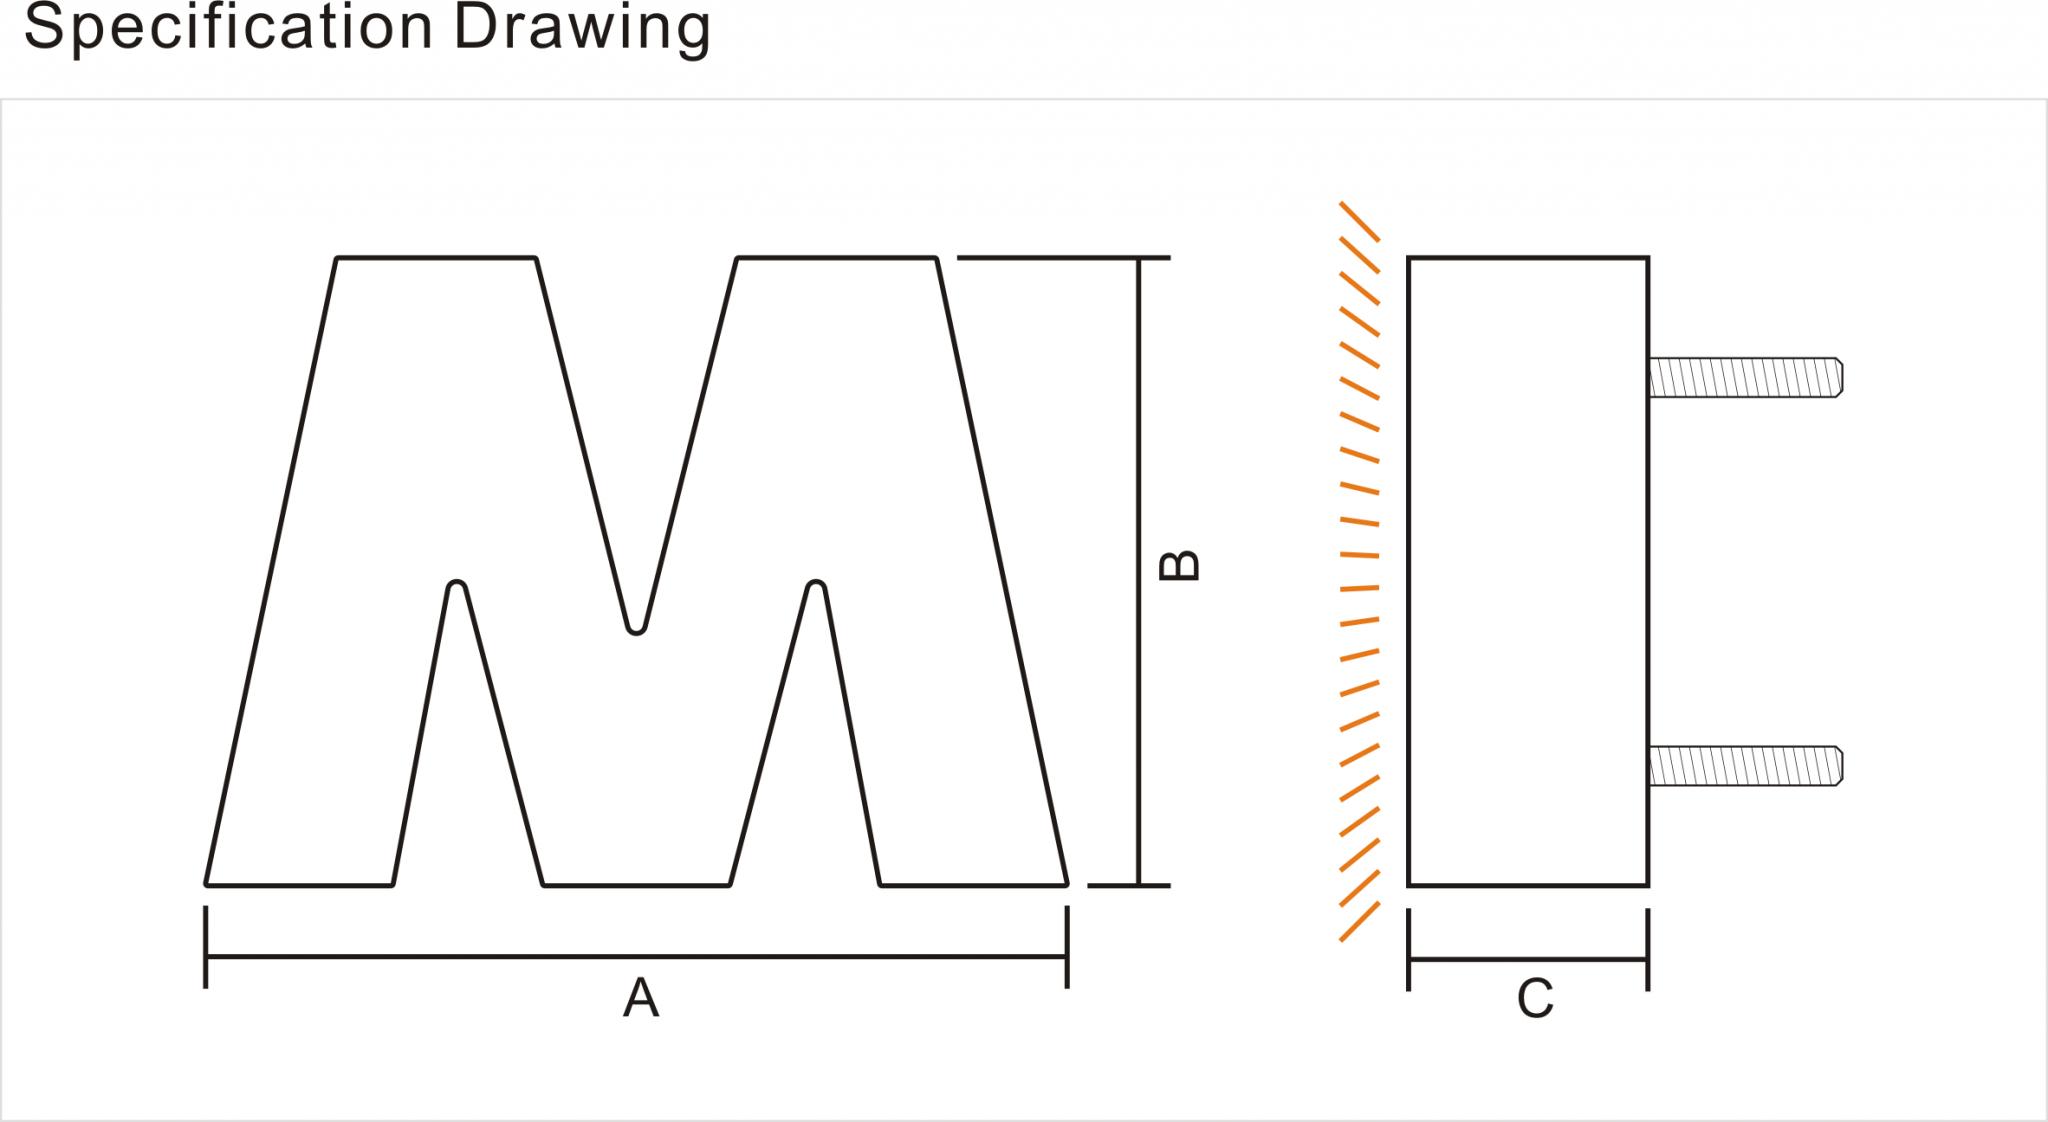 M01-11